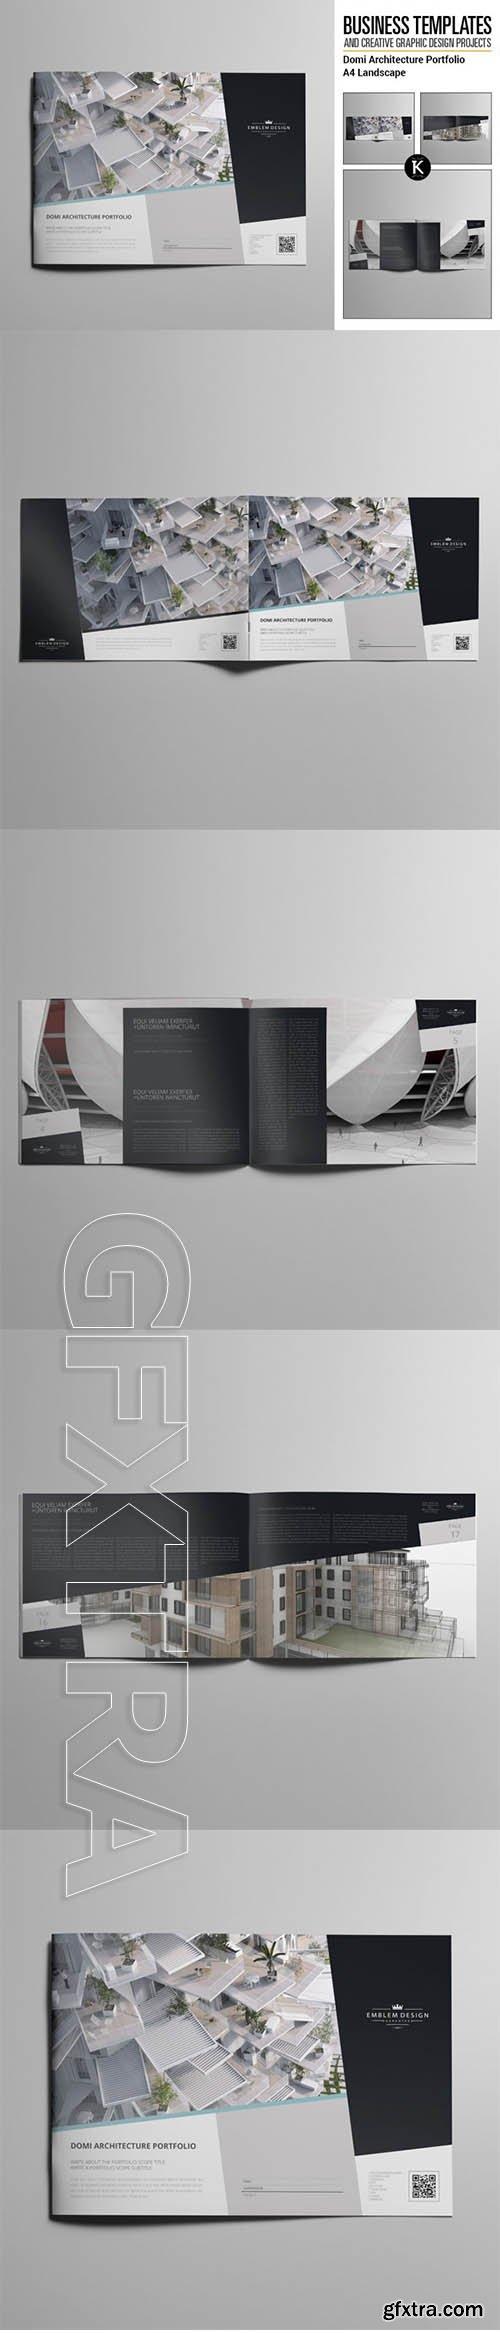 keboto - Domi Architecture Portfolio A4 Landscape